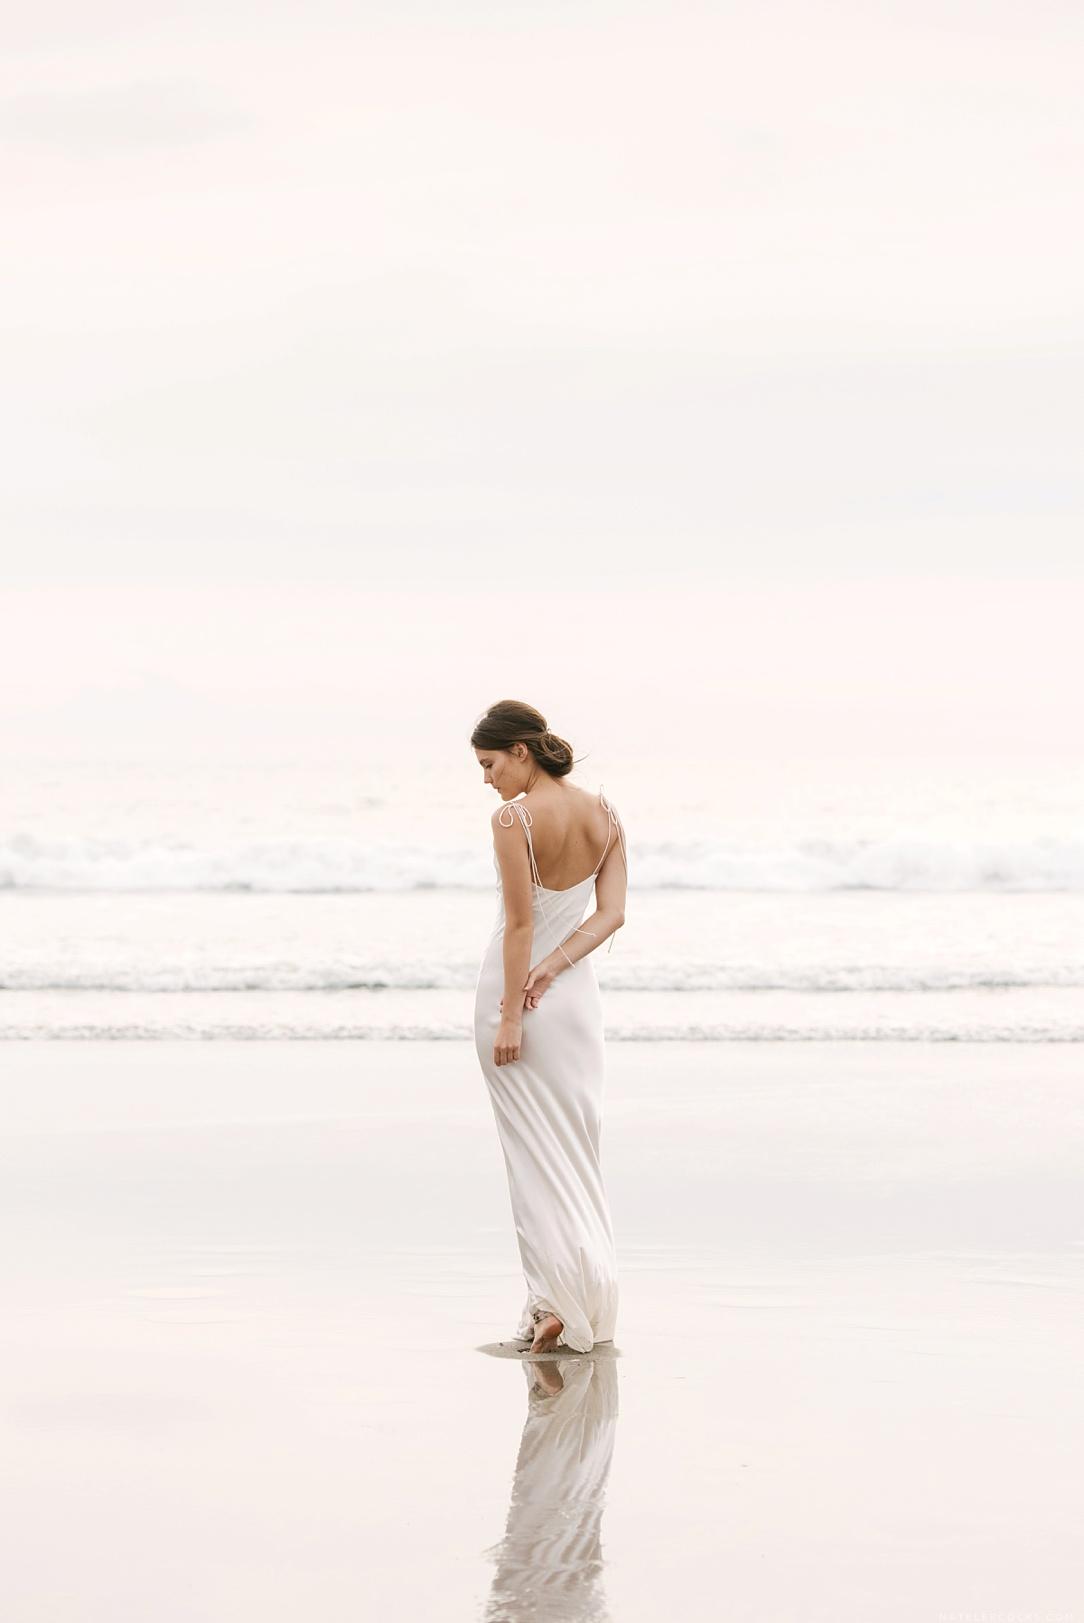 BALI BEACH MAGIC| MAGGIE WU STUDIO